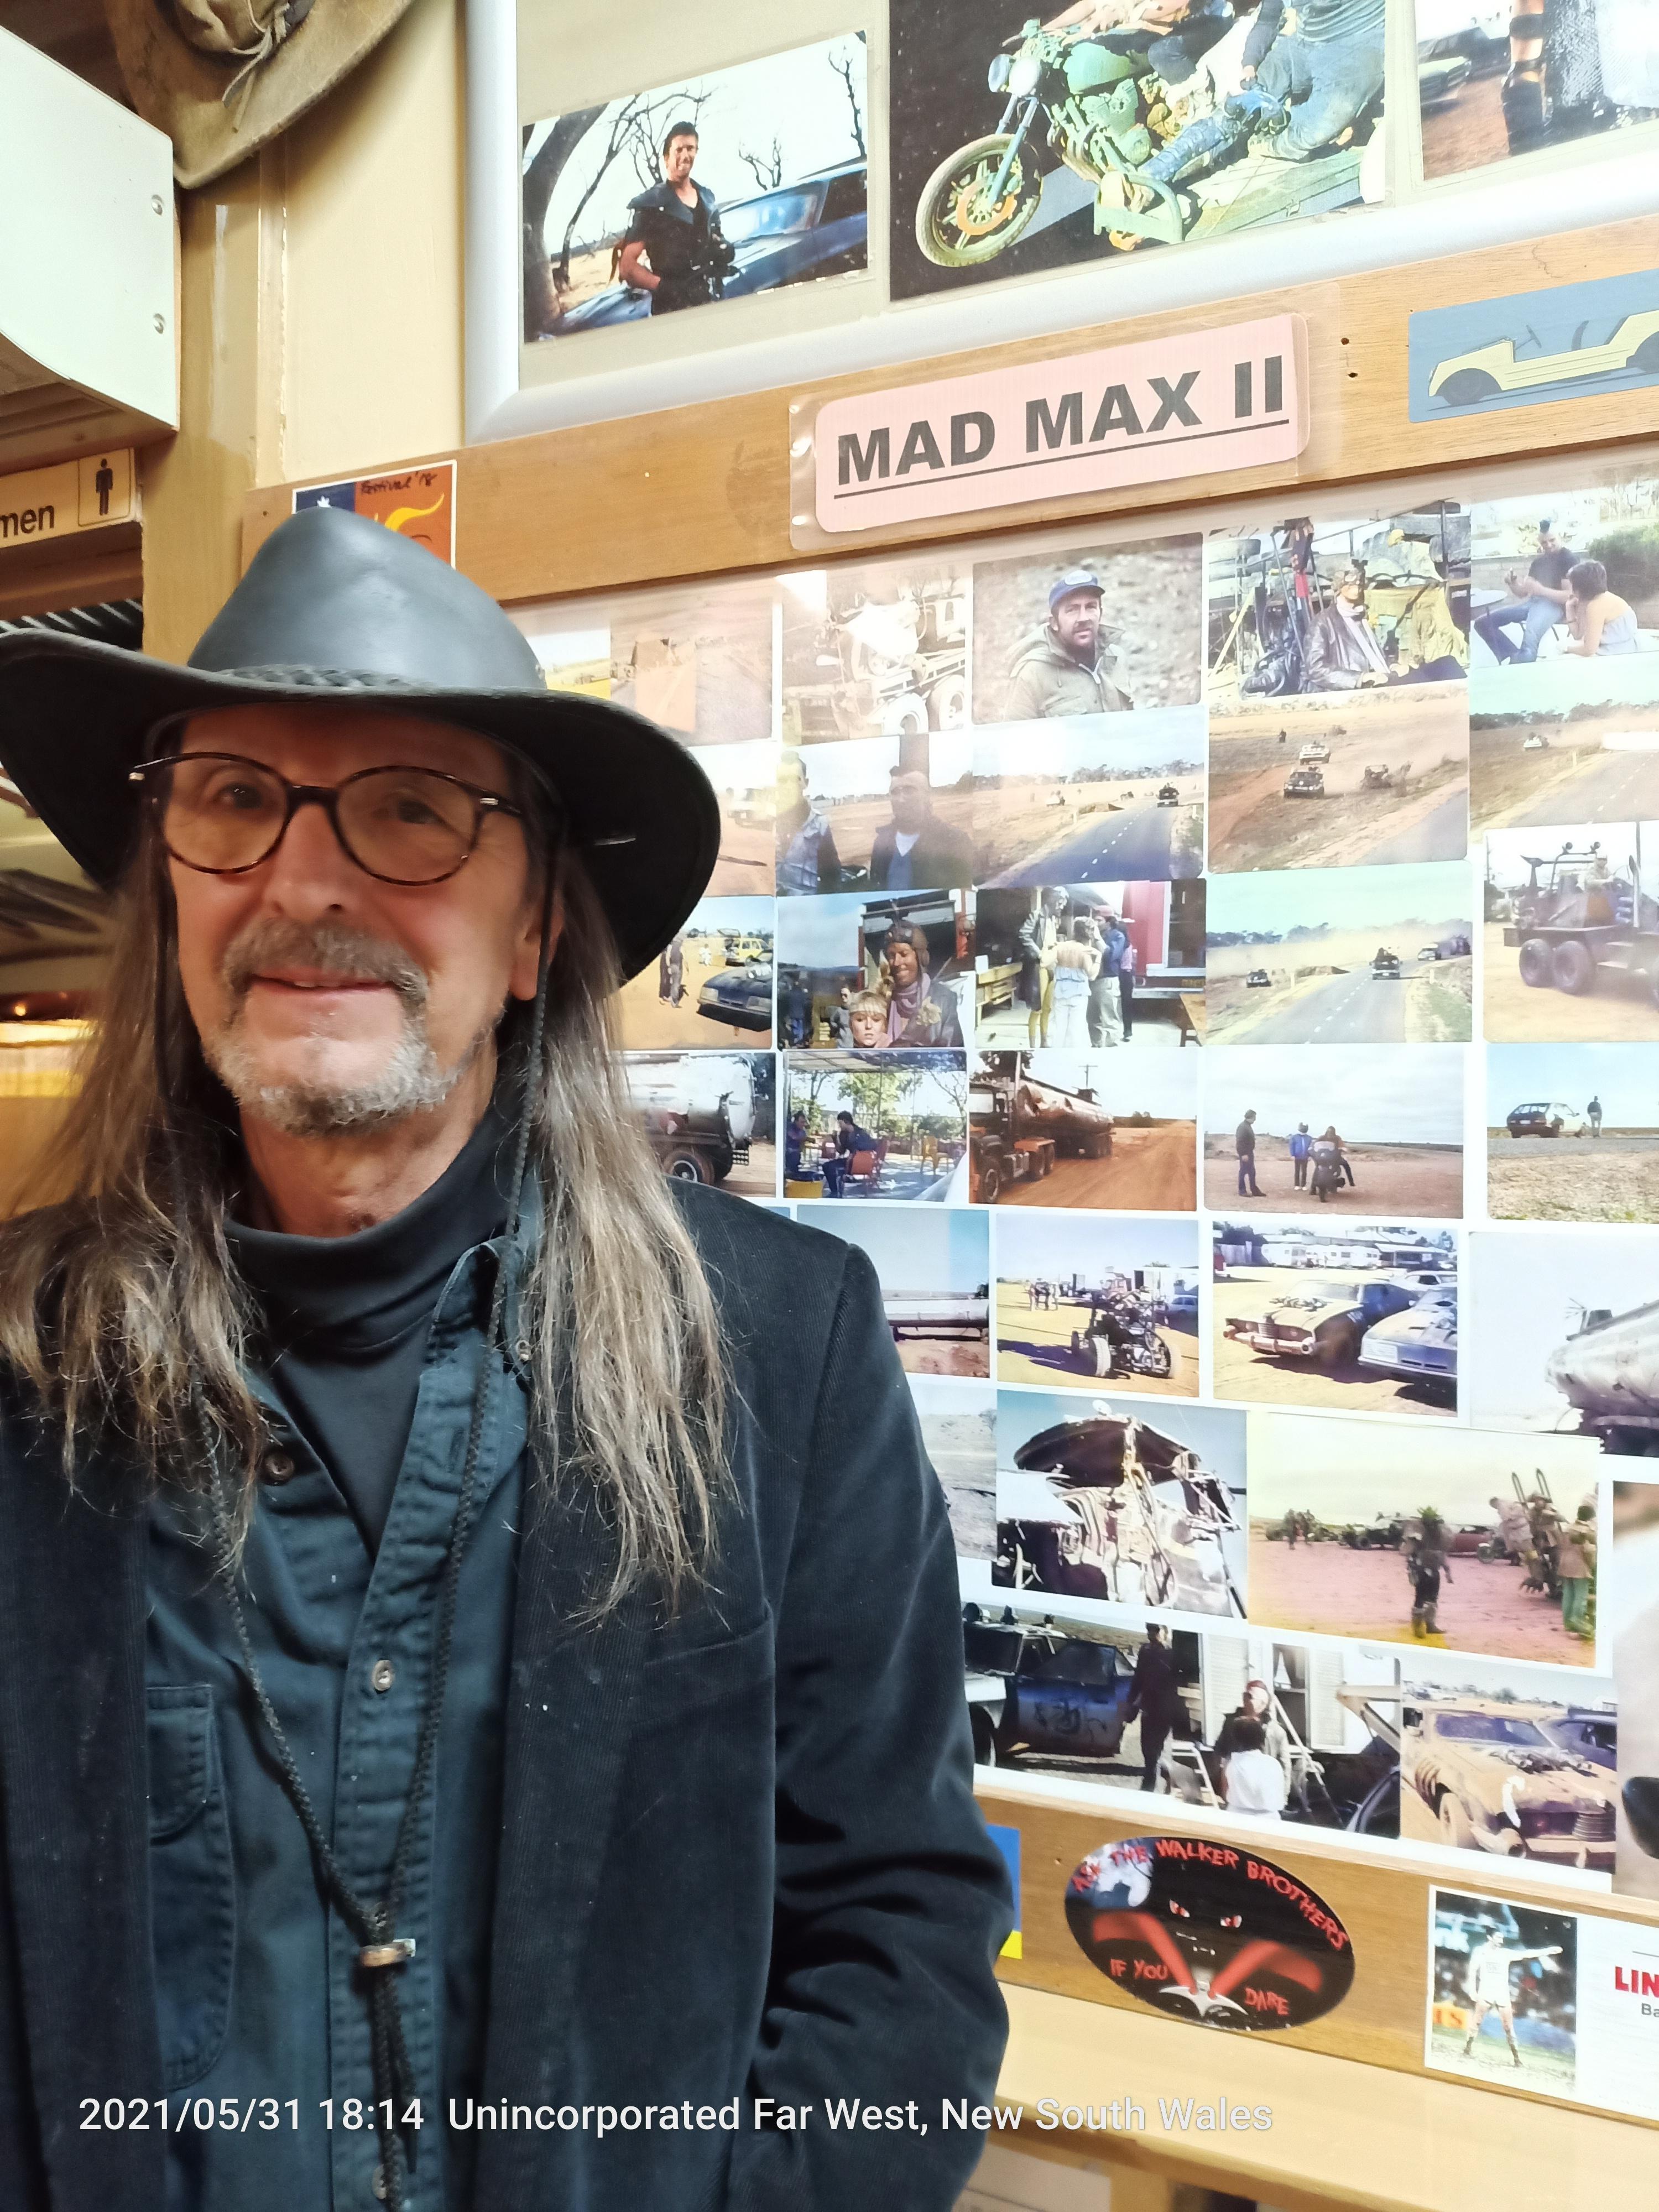 Mad Max Silverton NSW